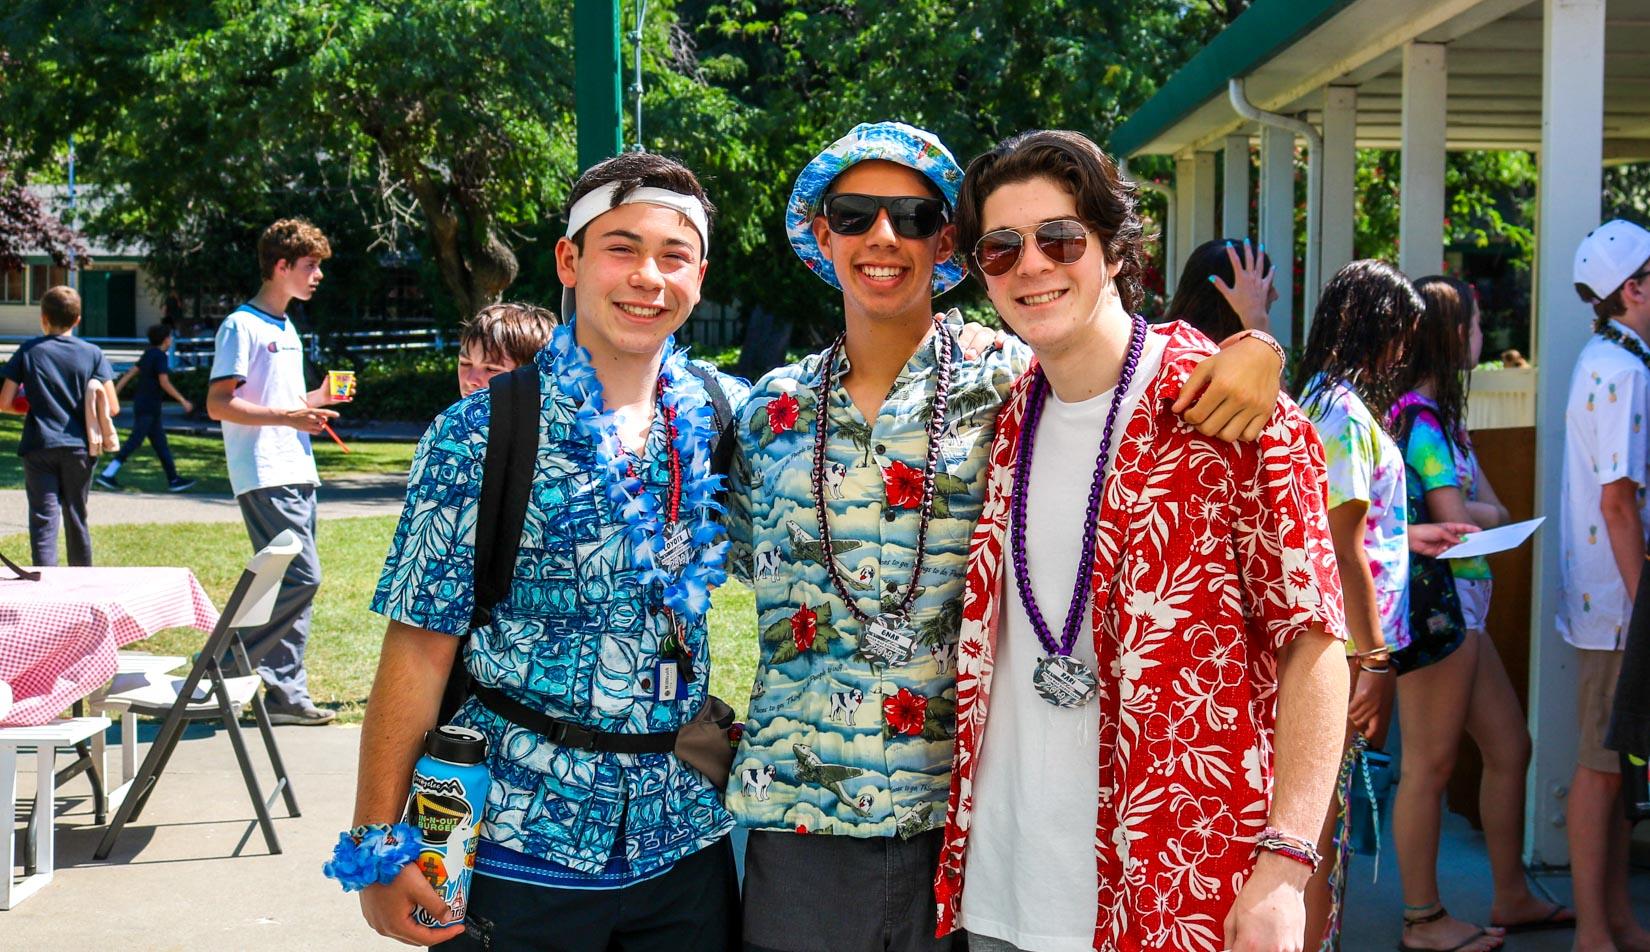 CITs dressed up in hawaiian print shirts